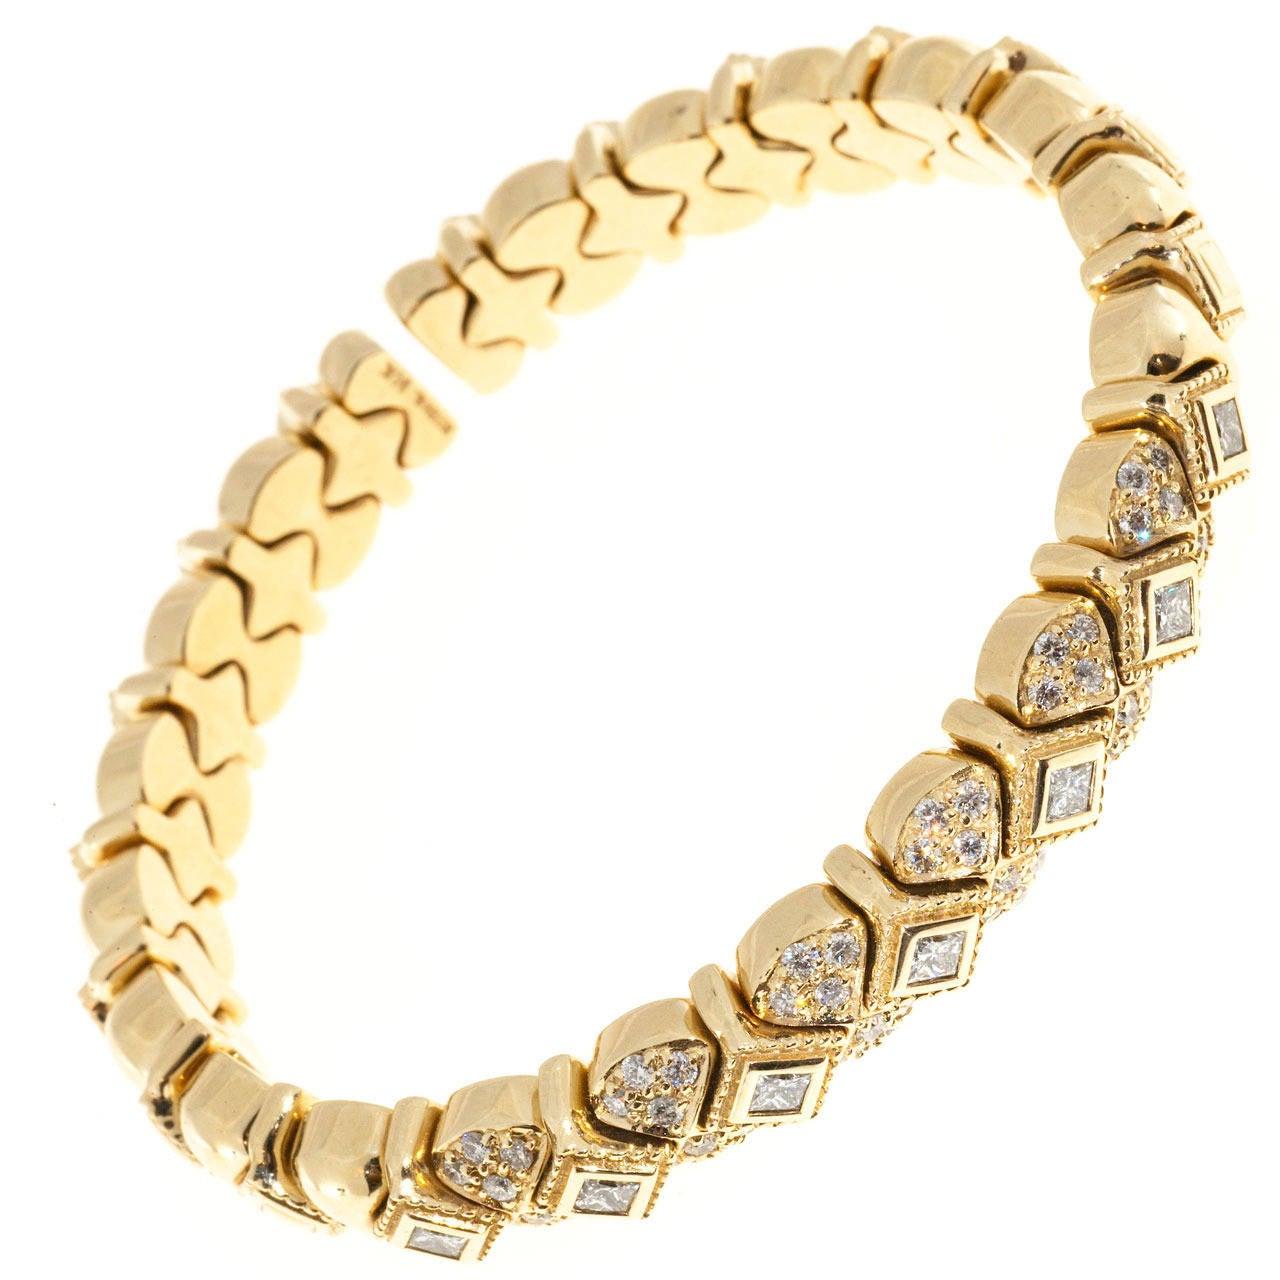 Sonia B Galerie de Bijoux Diamond Gold Flex Bracelet